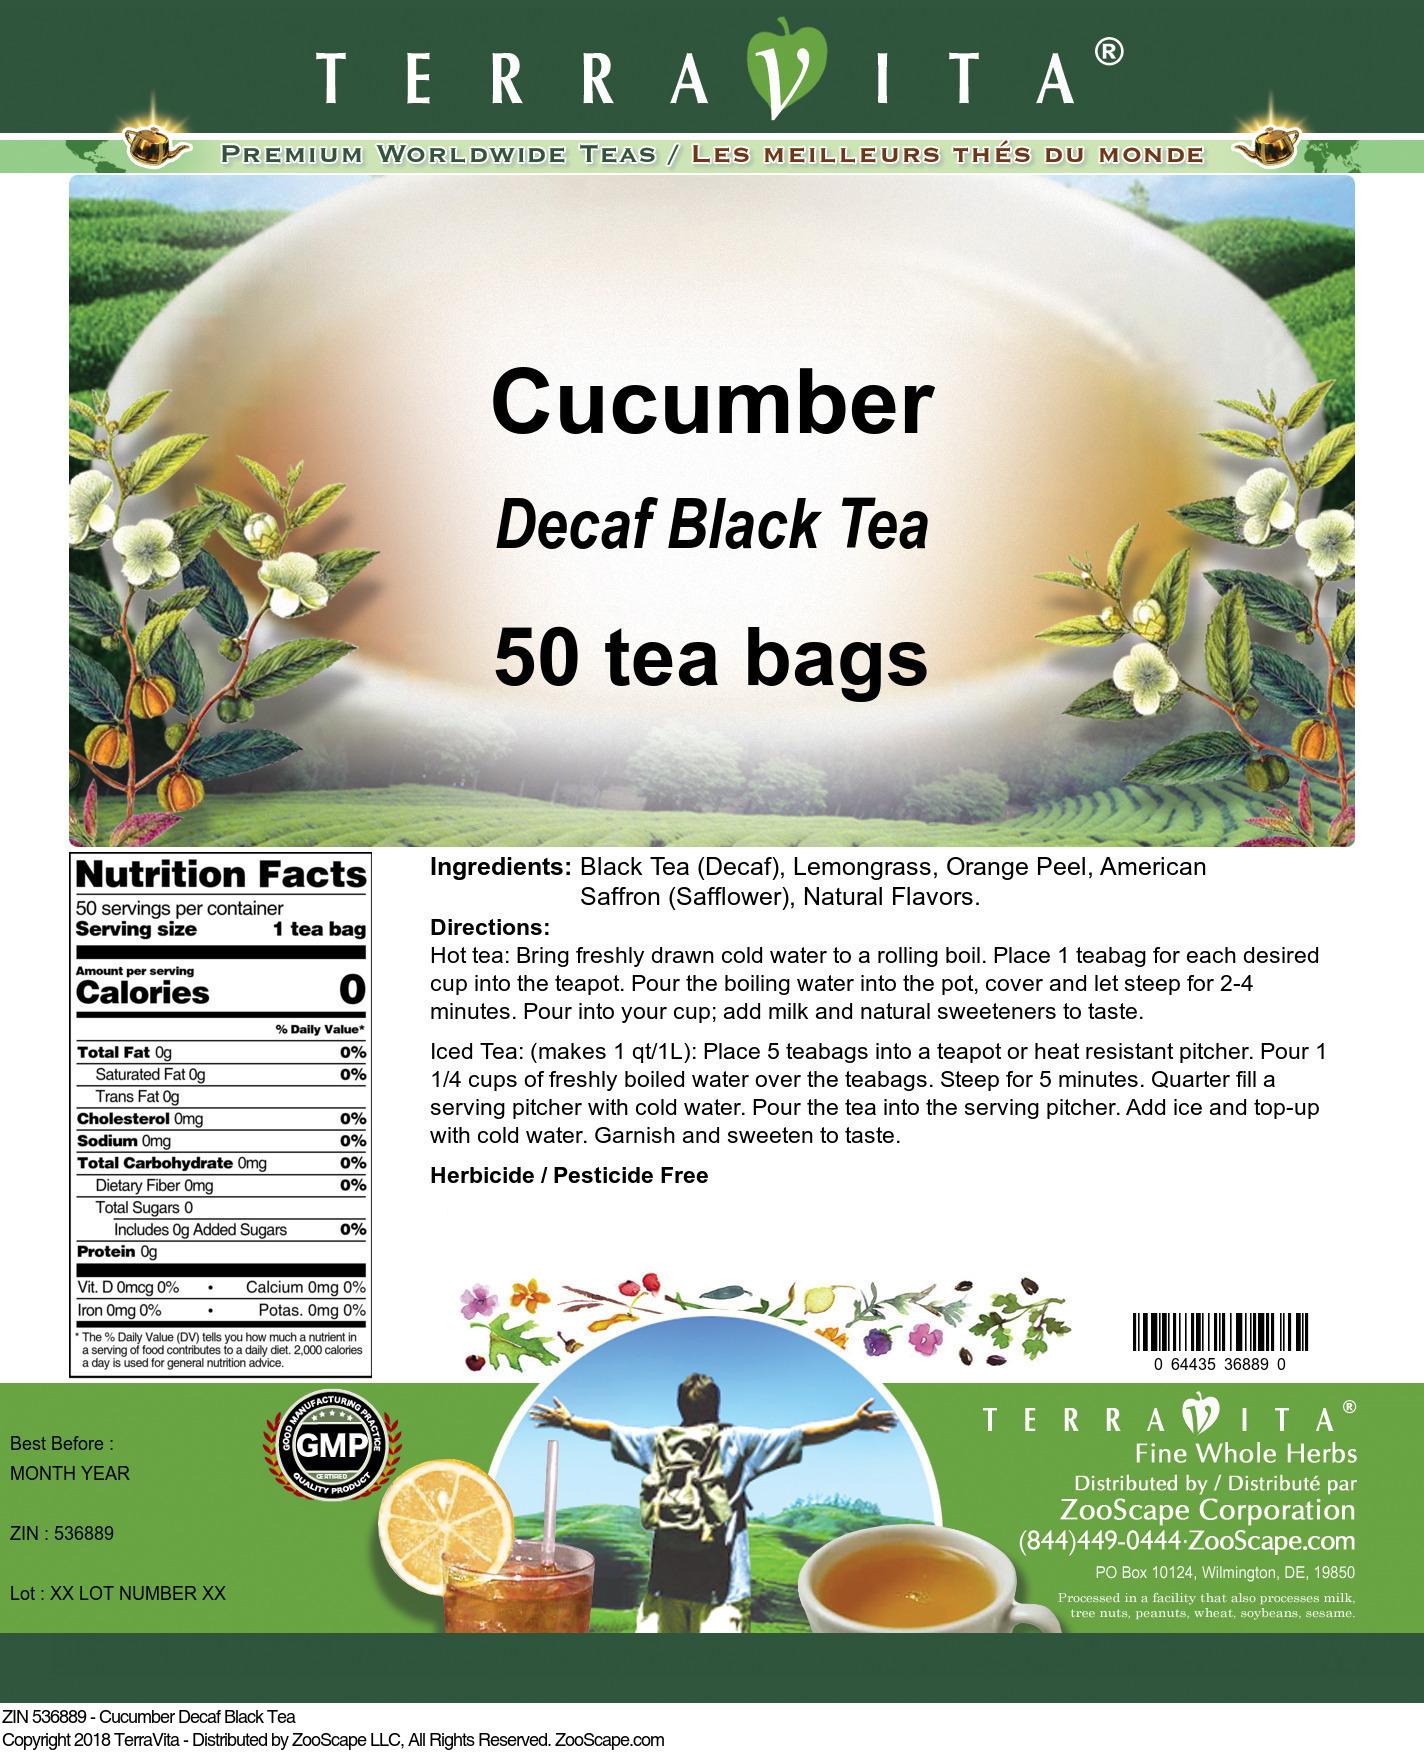 Cucumber Decaf Black Tea